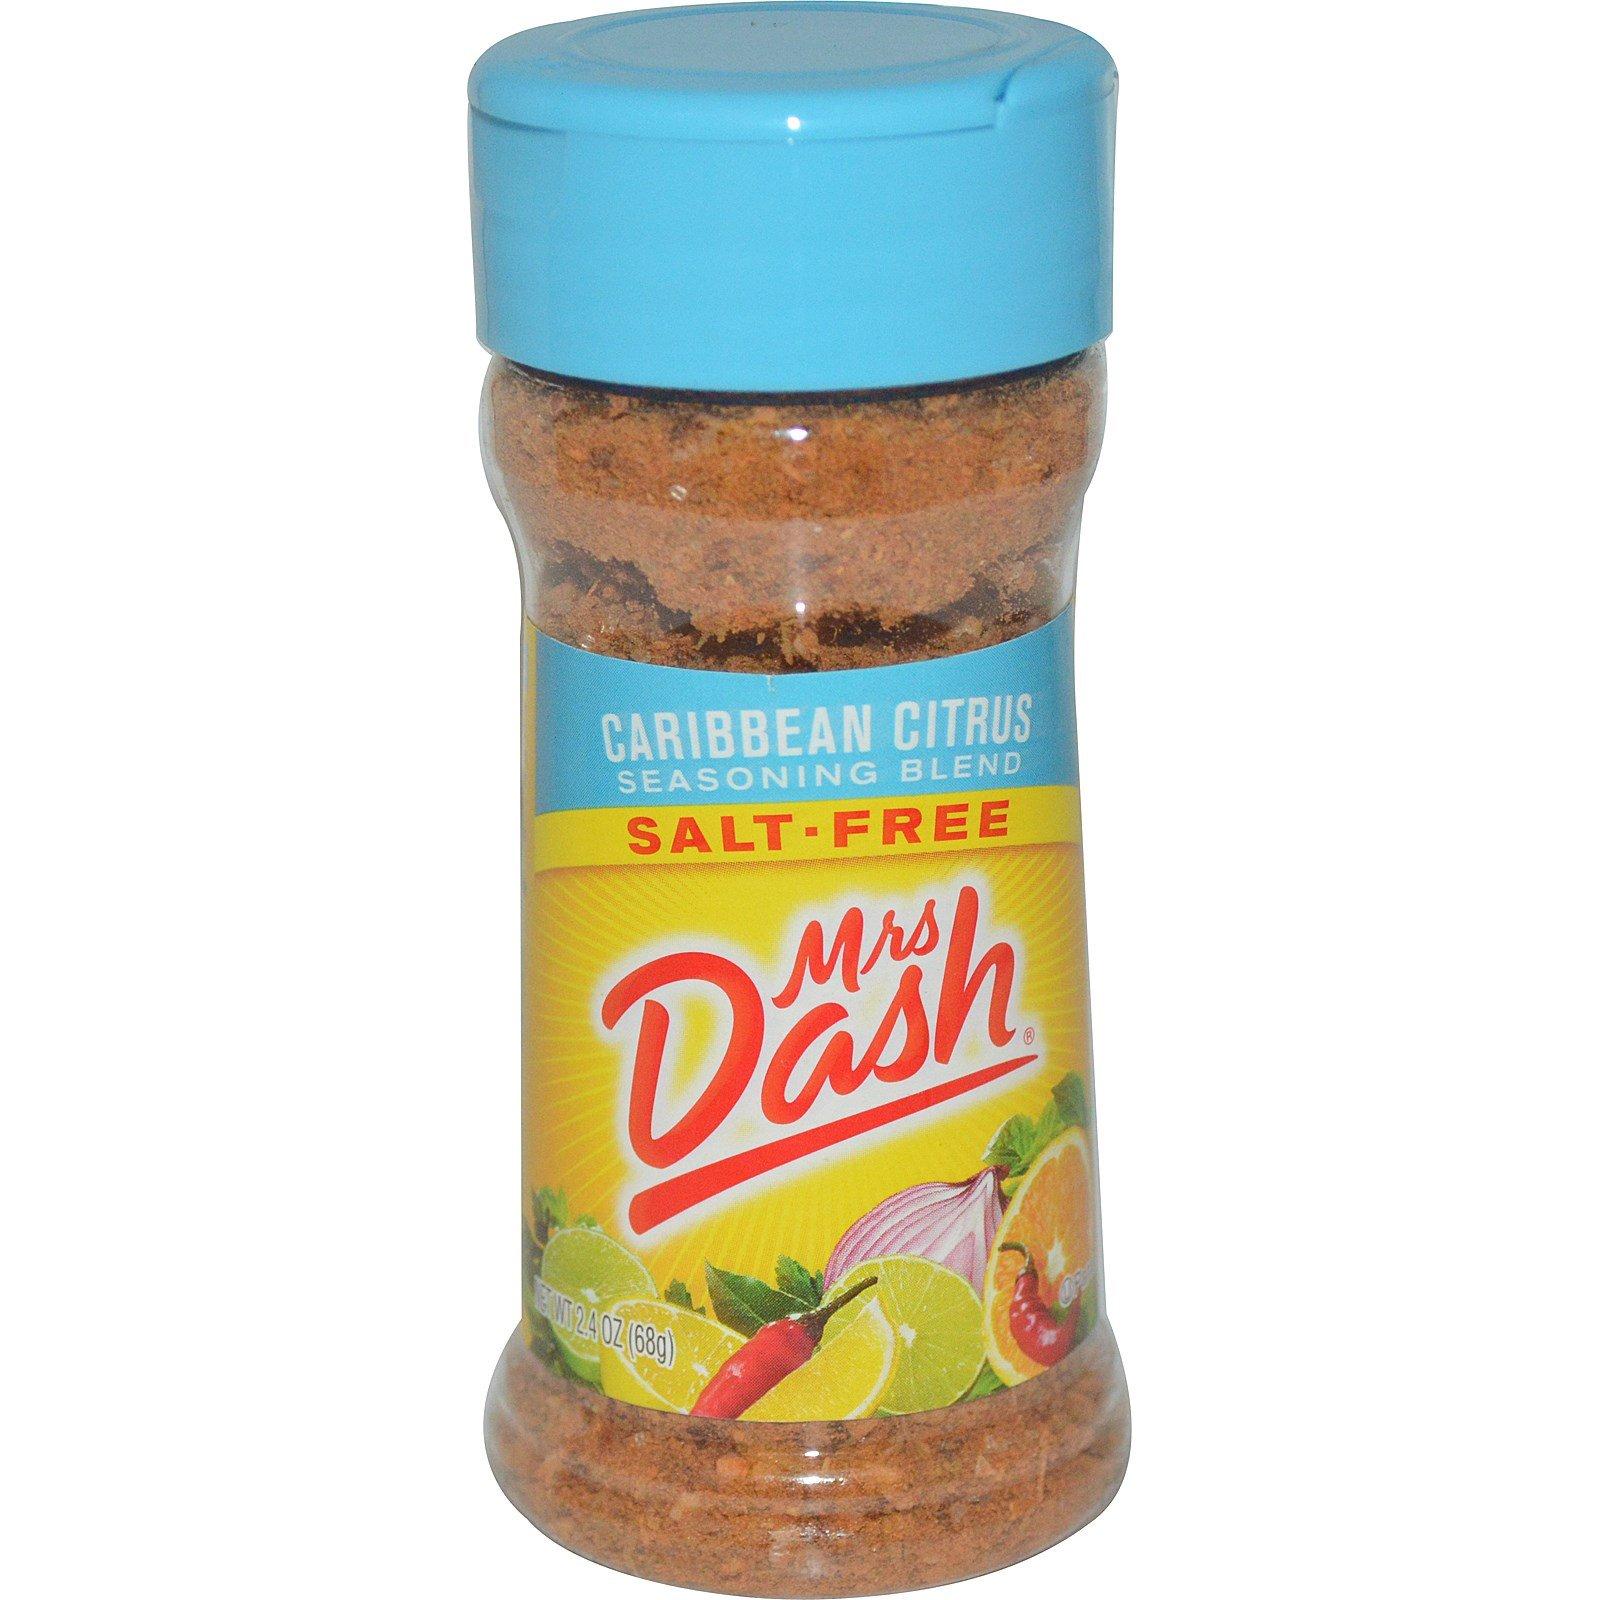 Mrs. Dash, Seasoning Blend, Caribbean Citrus, 2.4 Ounce